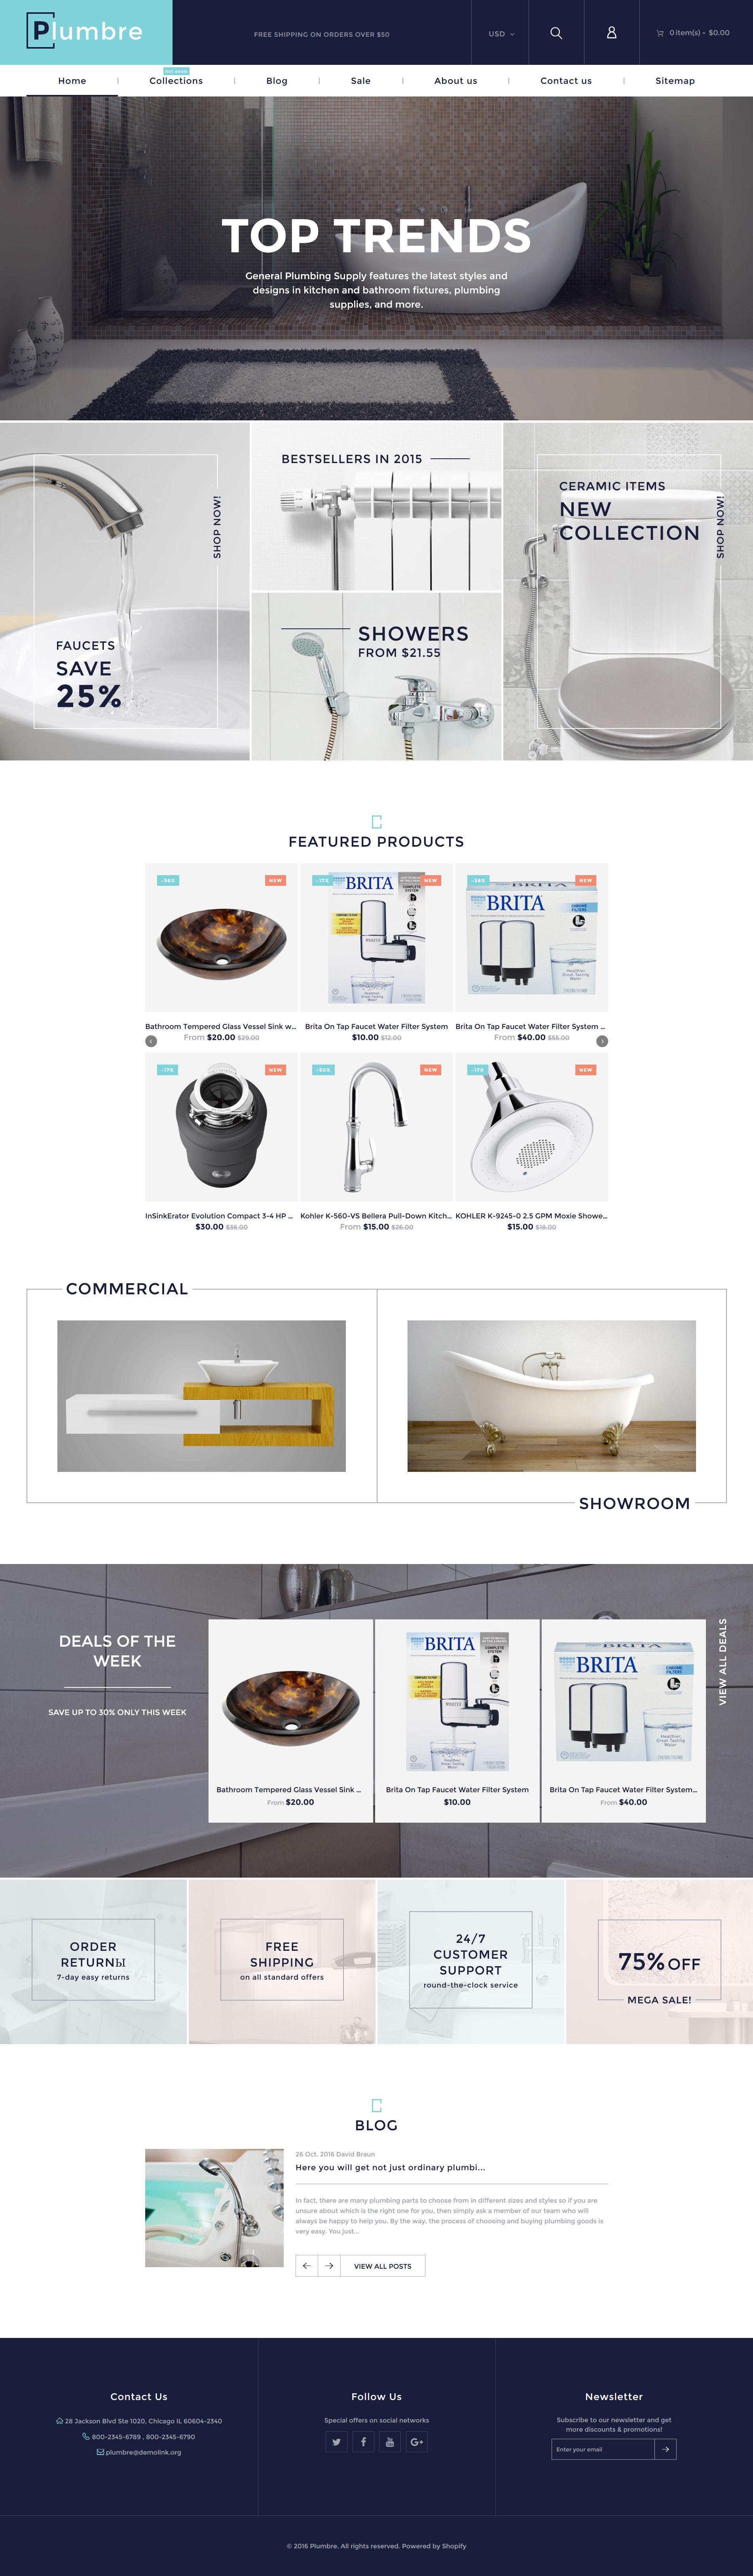 Plumbre - Plumbing & Building Parts Shopify Theme - screenshot